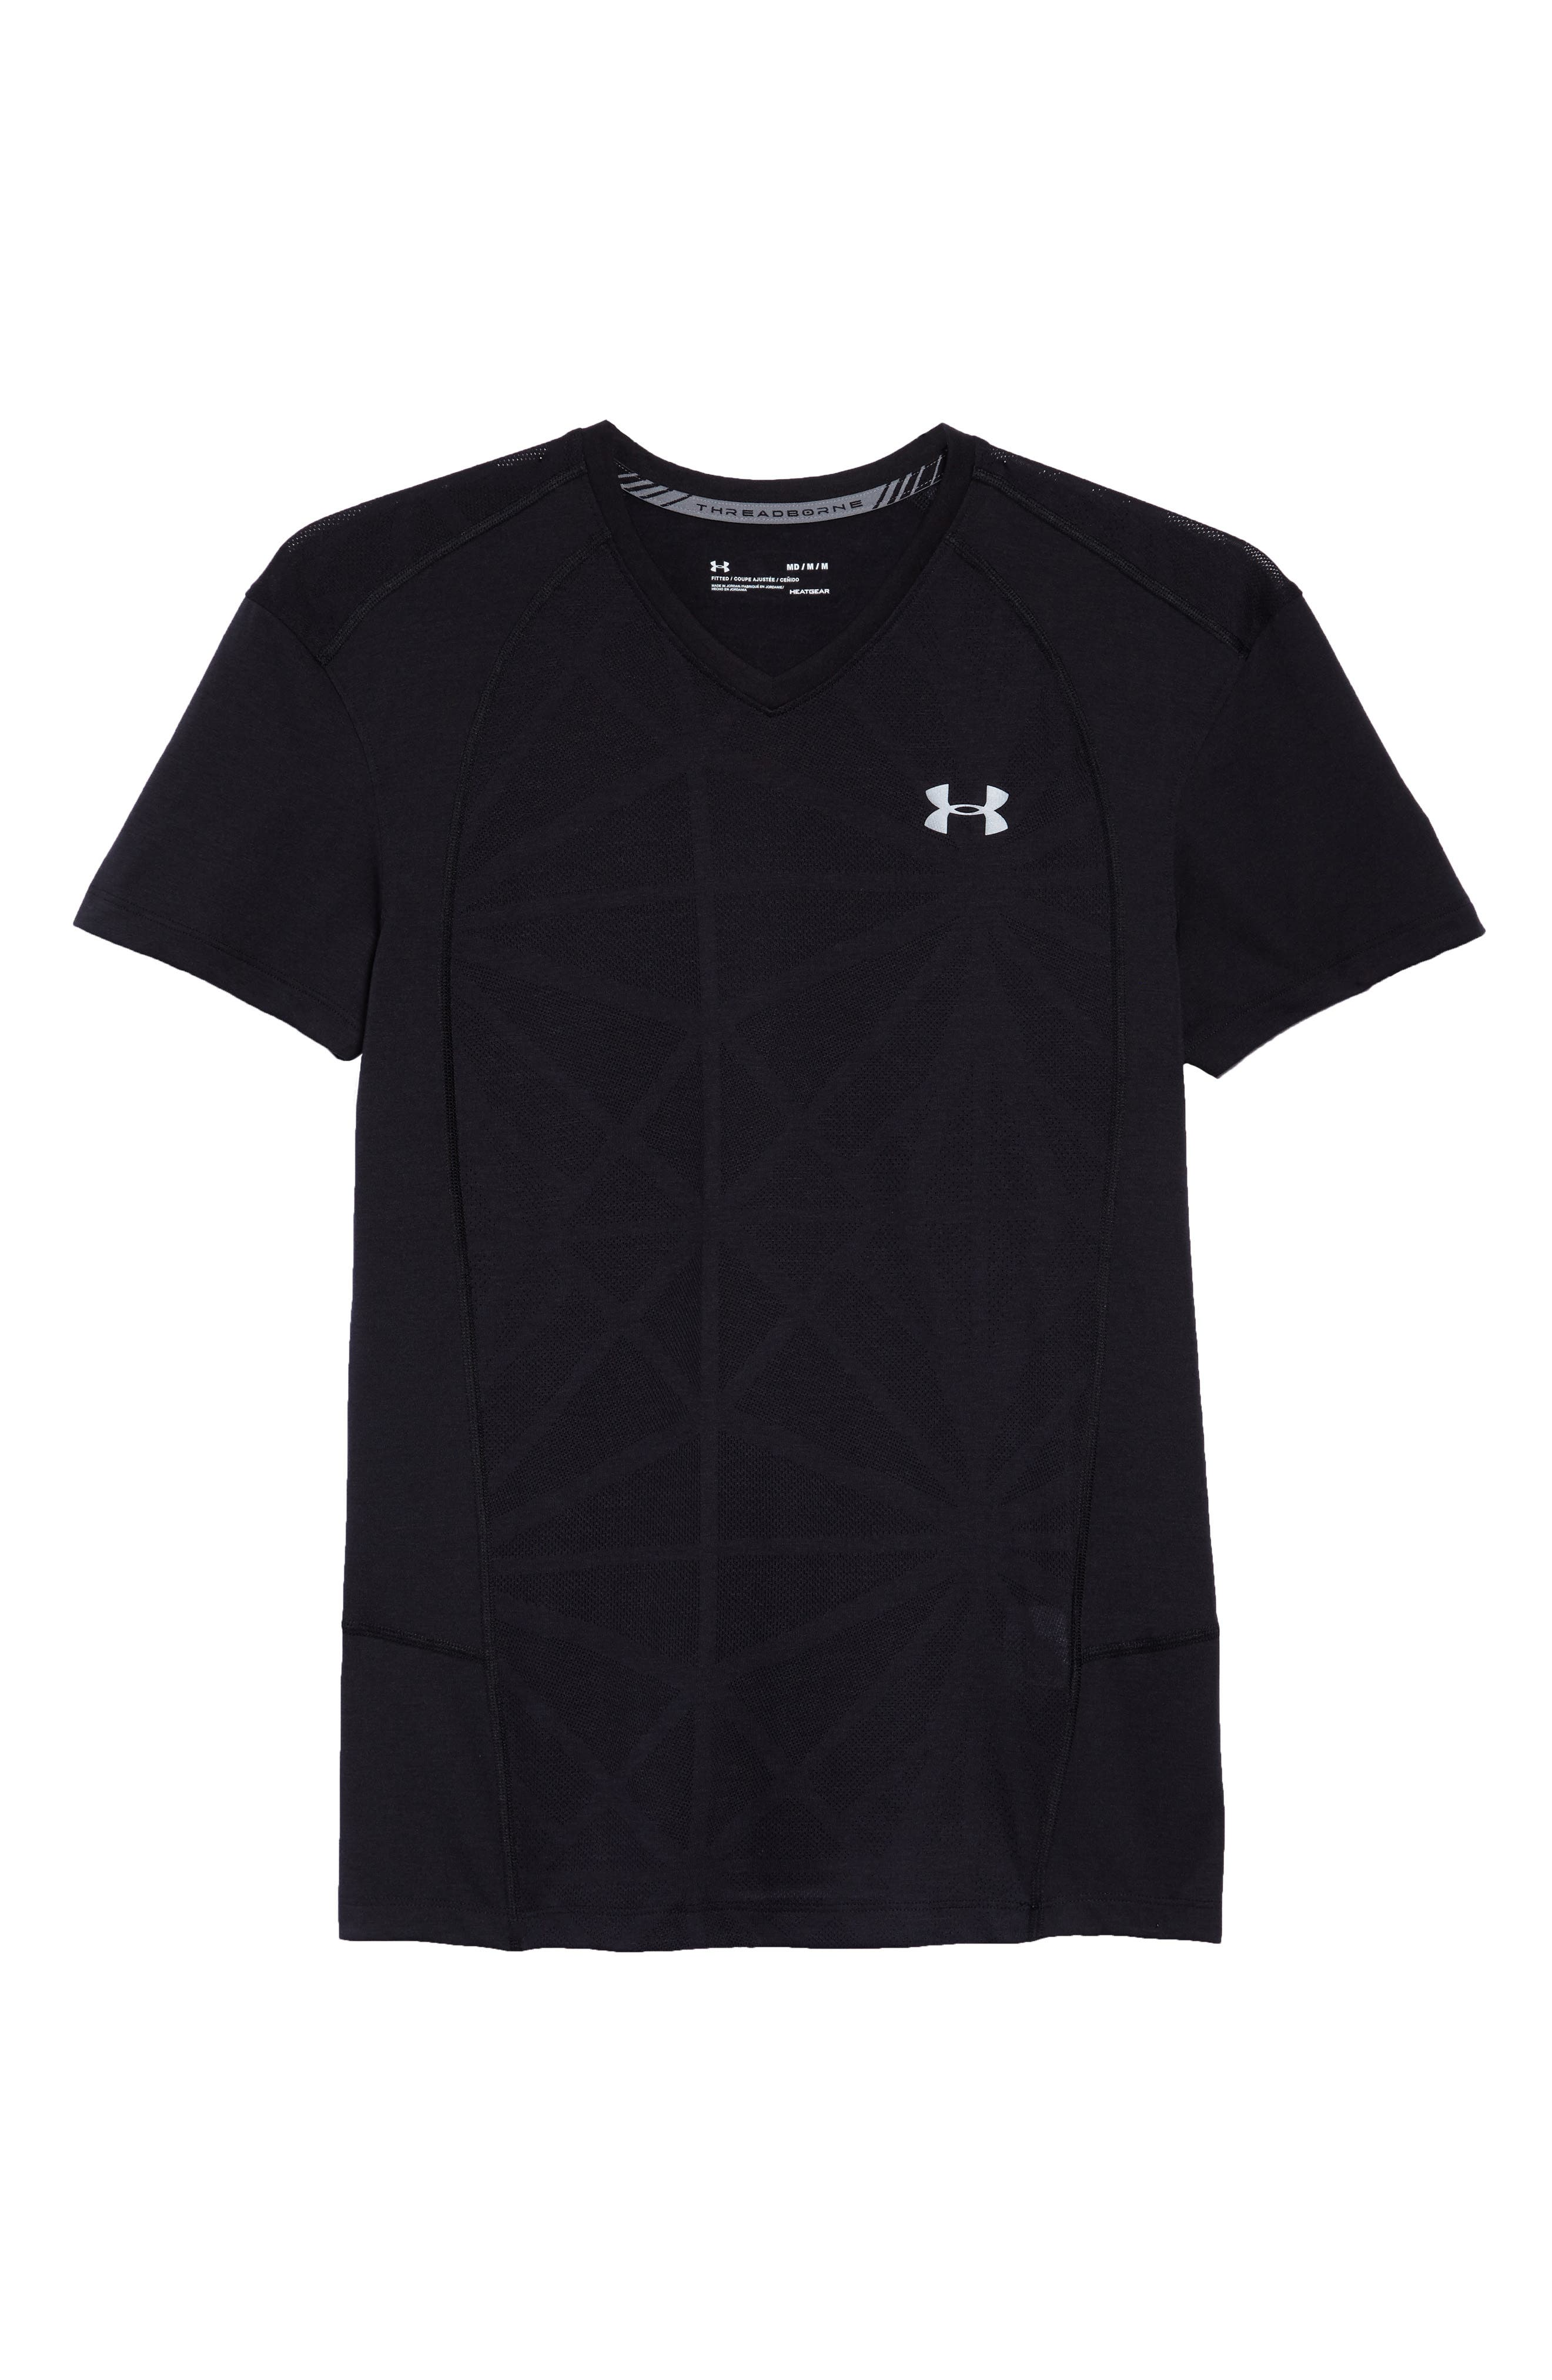 Microthread Swyft V-Neck T-Shirt,                             Alternate thumbnail 6, color,                             BLACK/ BLACK/ REFLECTIVE